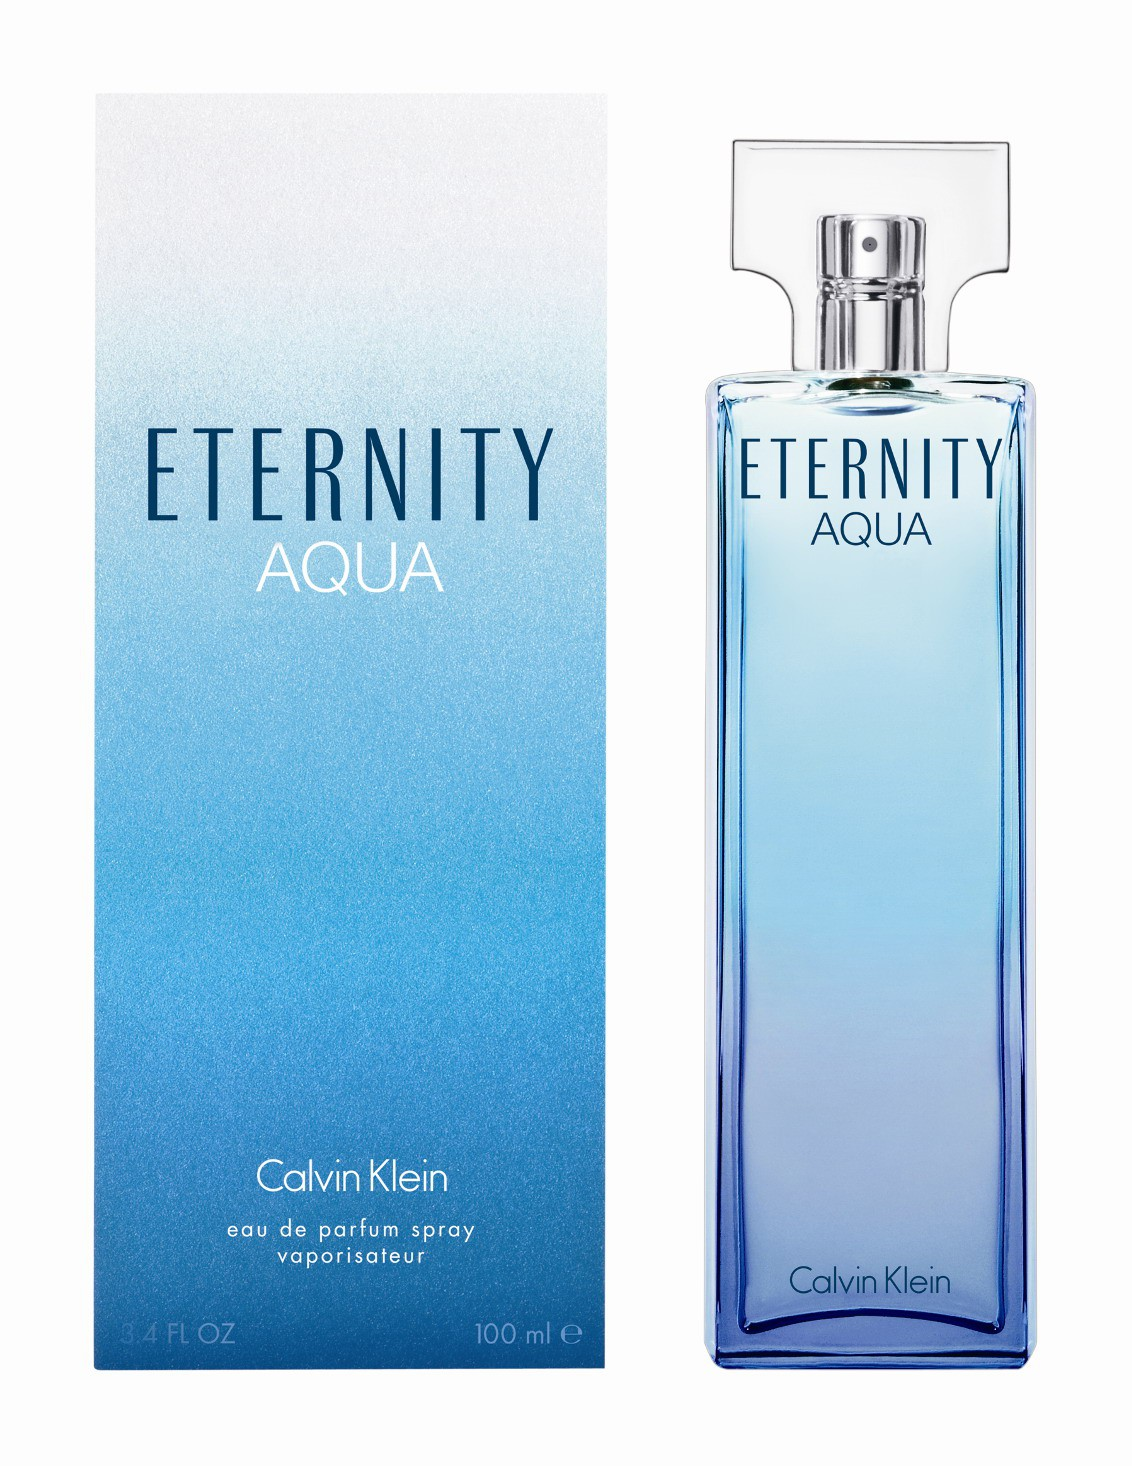 Calvin Klein Eternity Aqua аромат для женщин